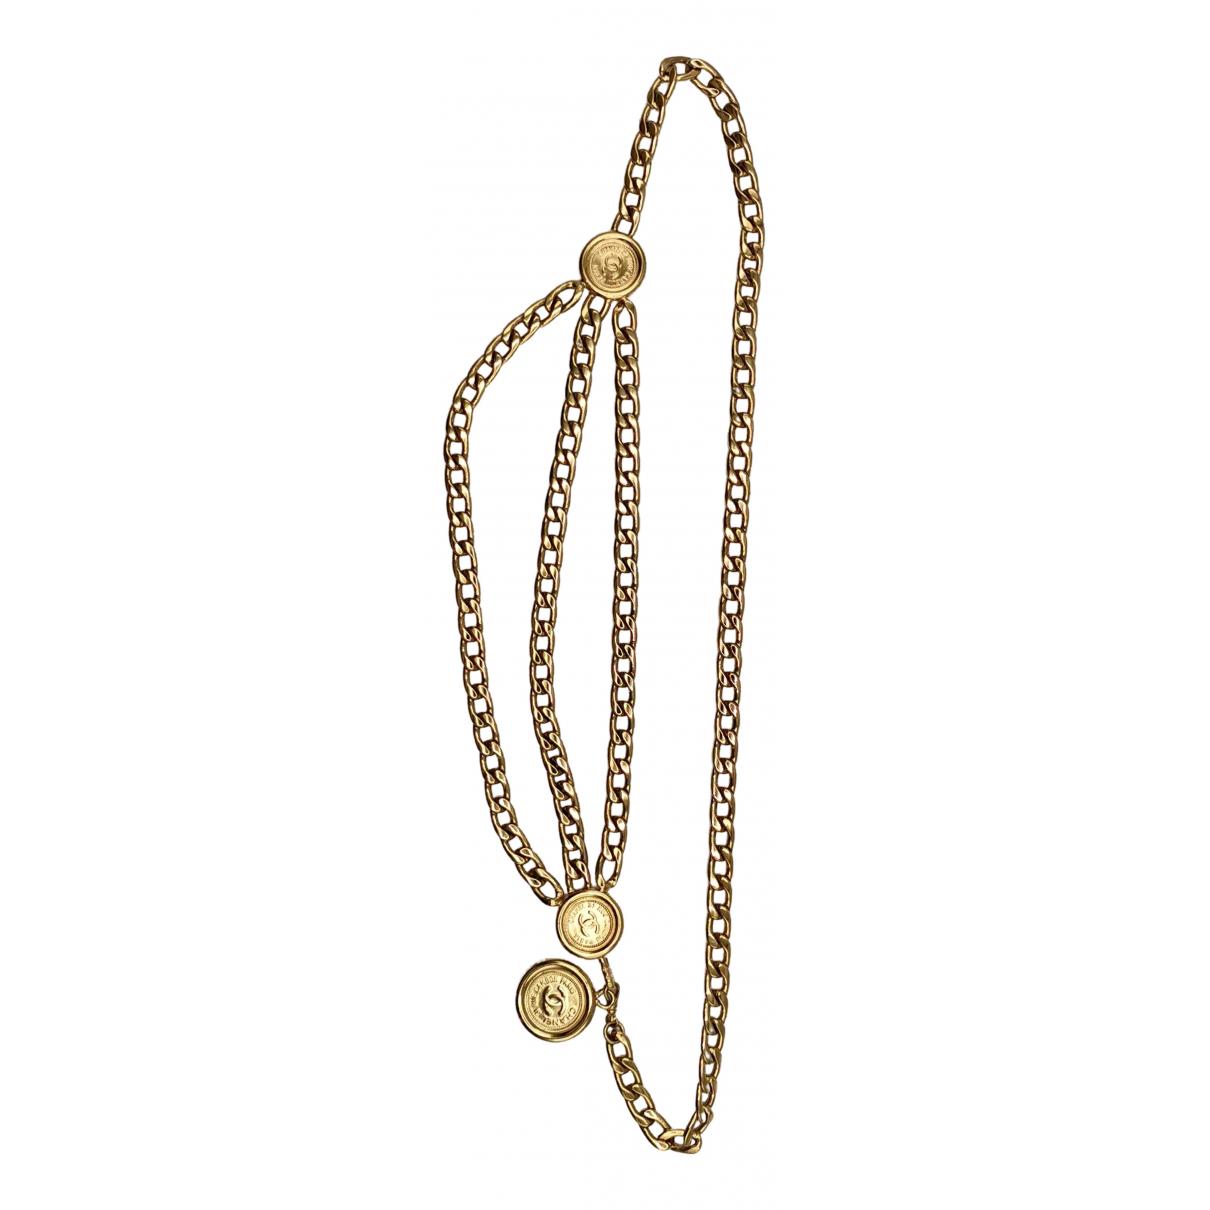 Chanel N Gold Metal belt for Women 90 cm